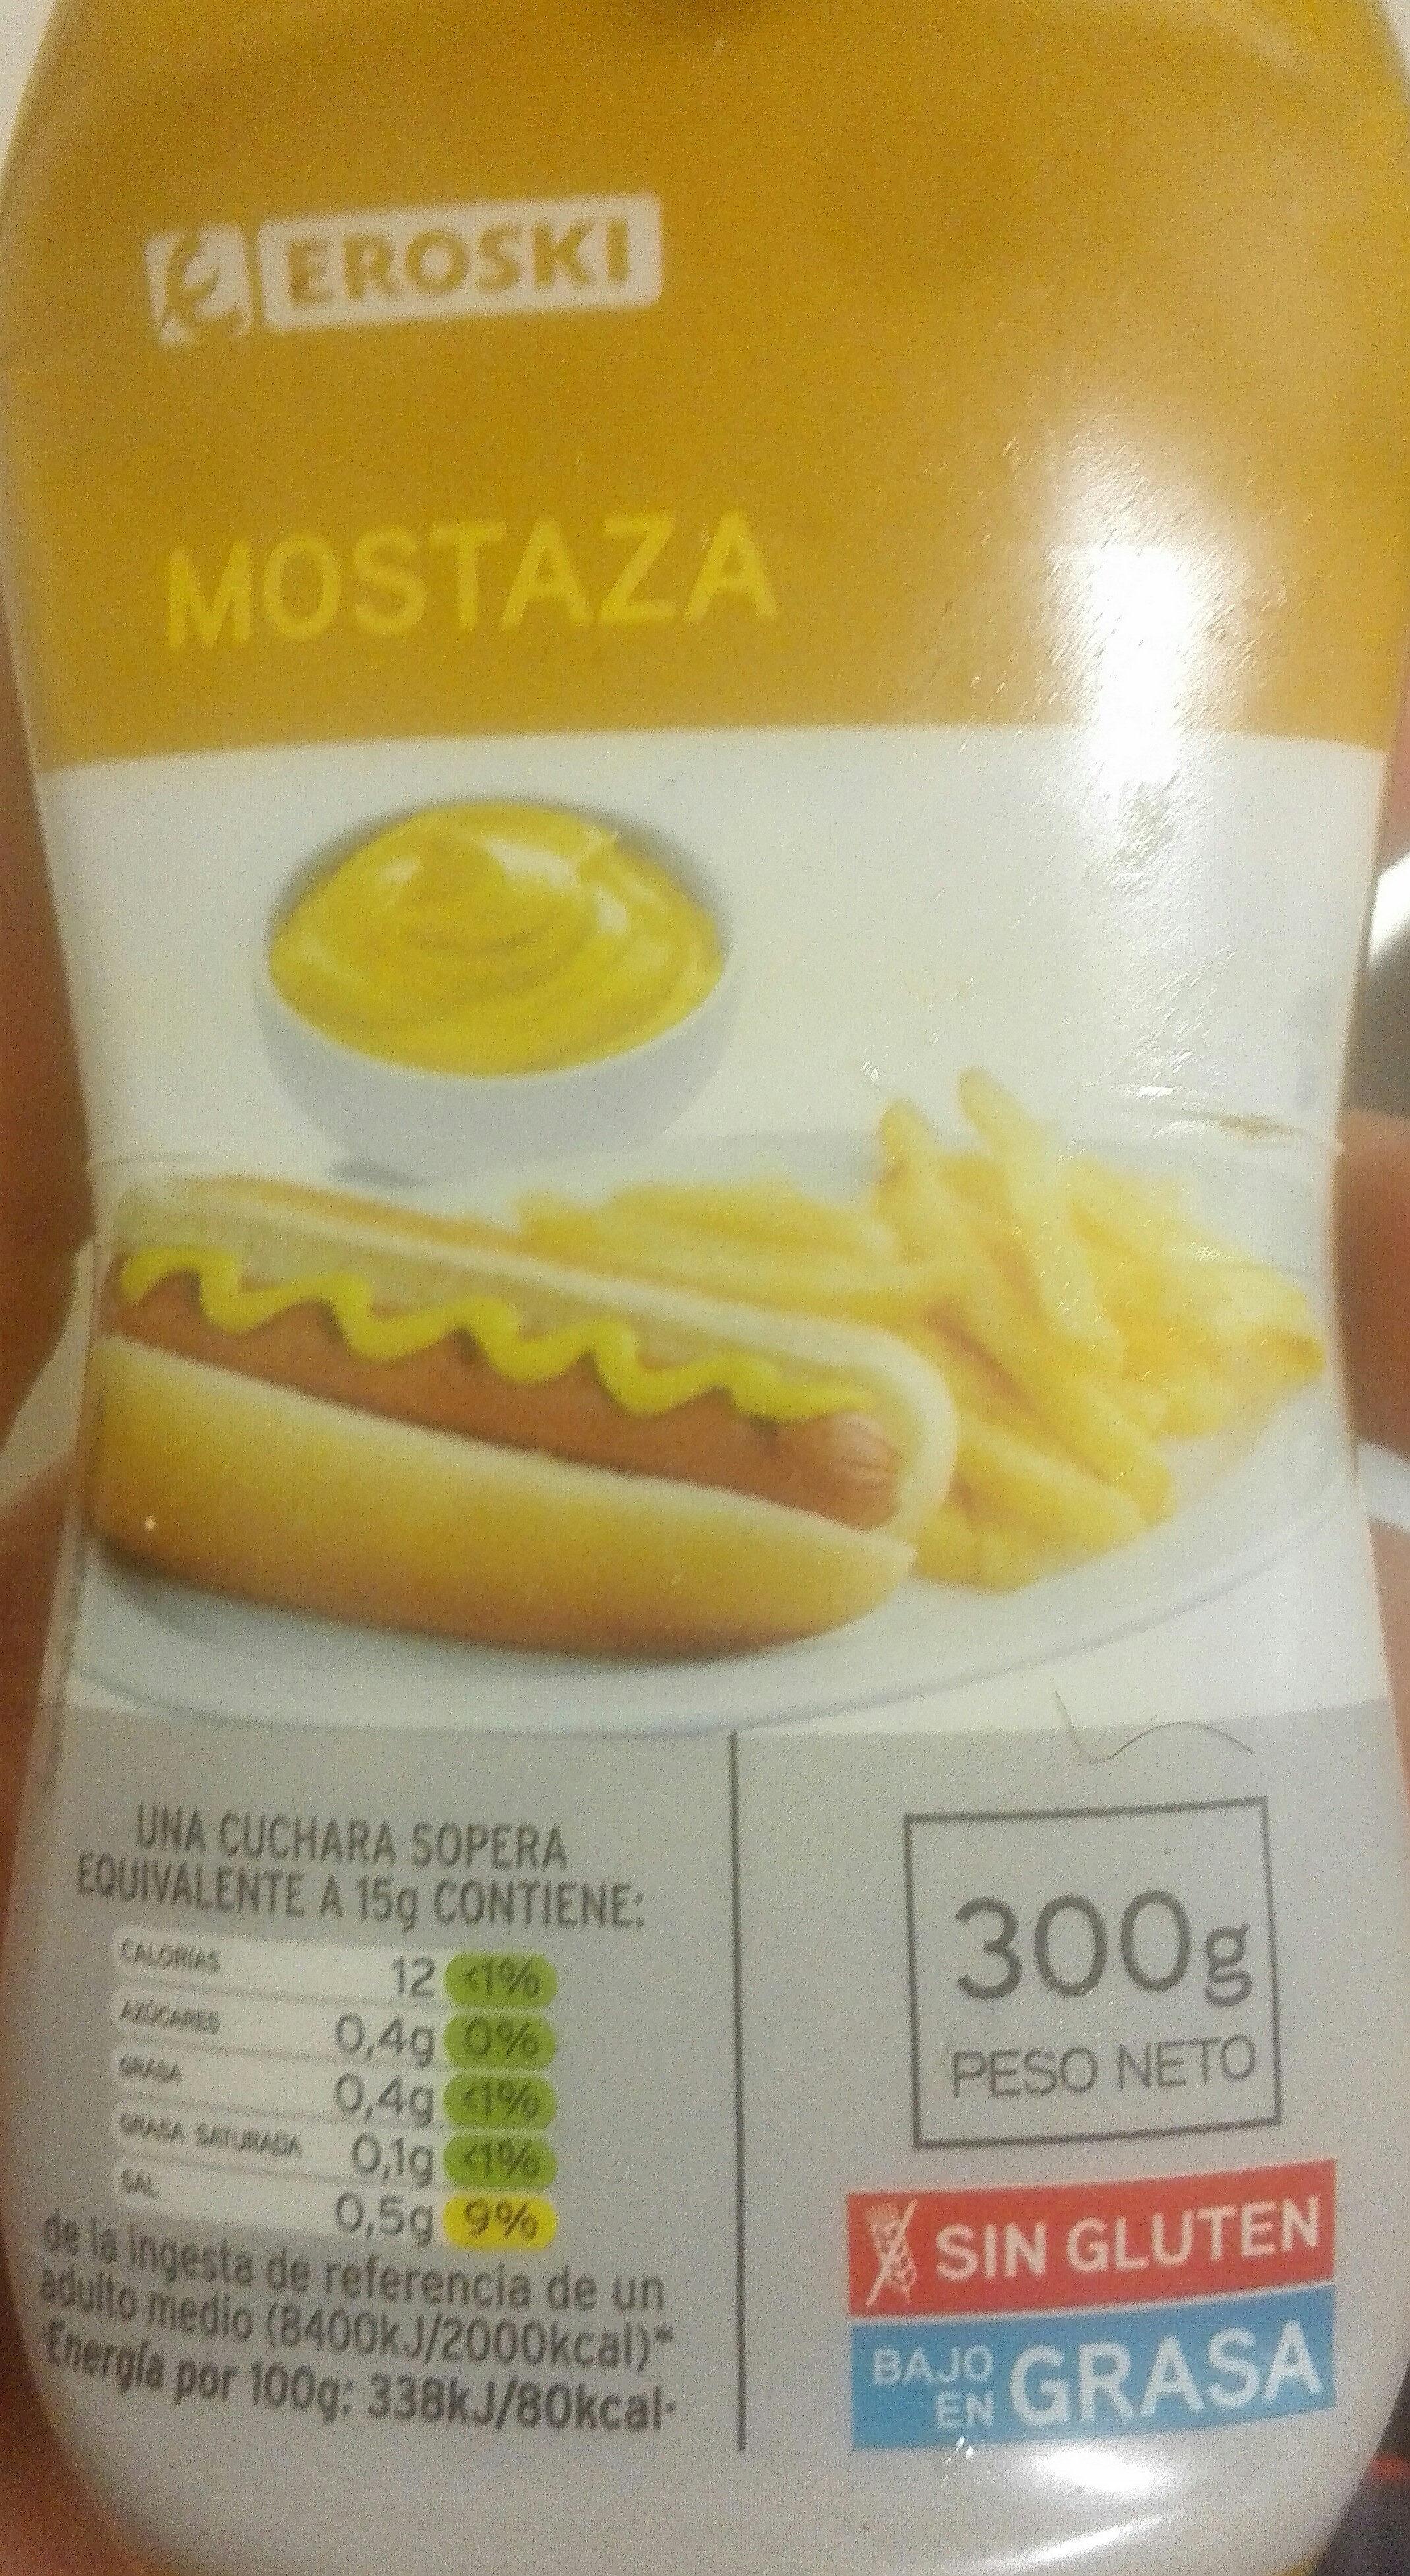 Mostaza - Producto